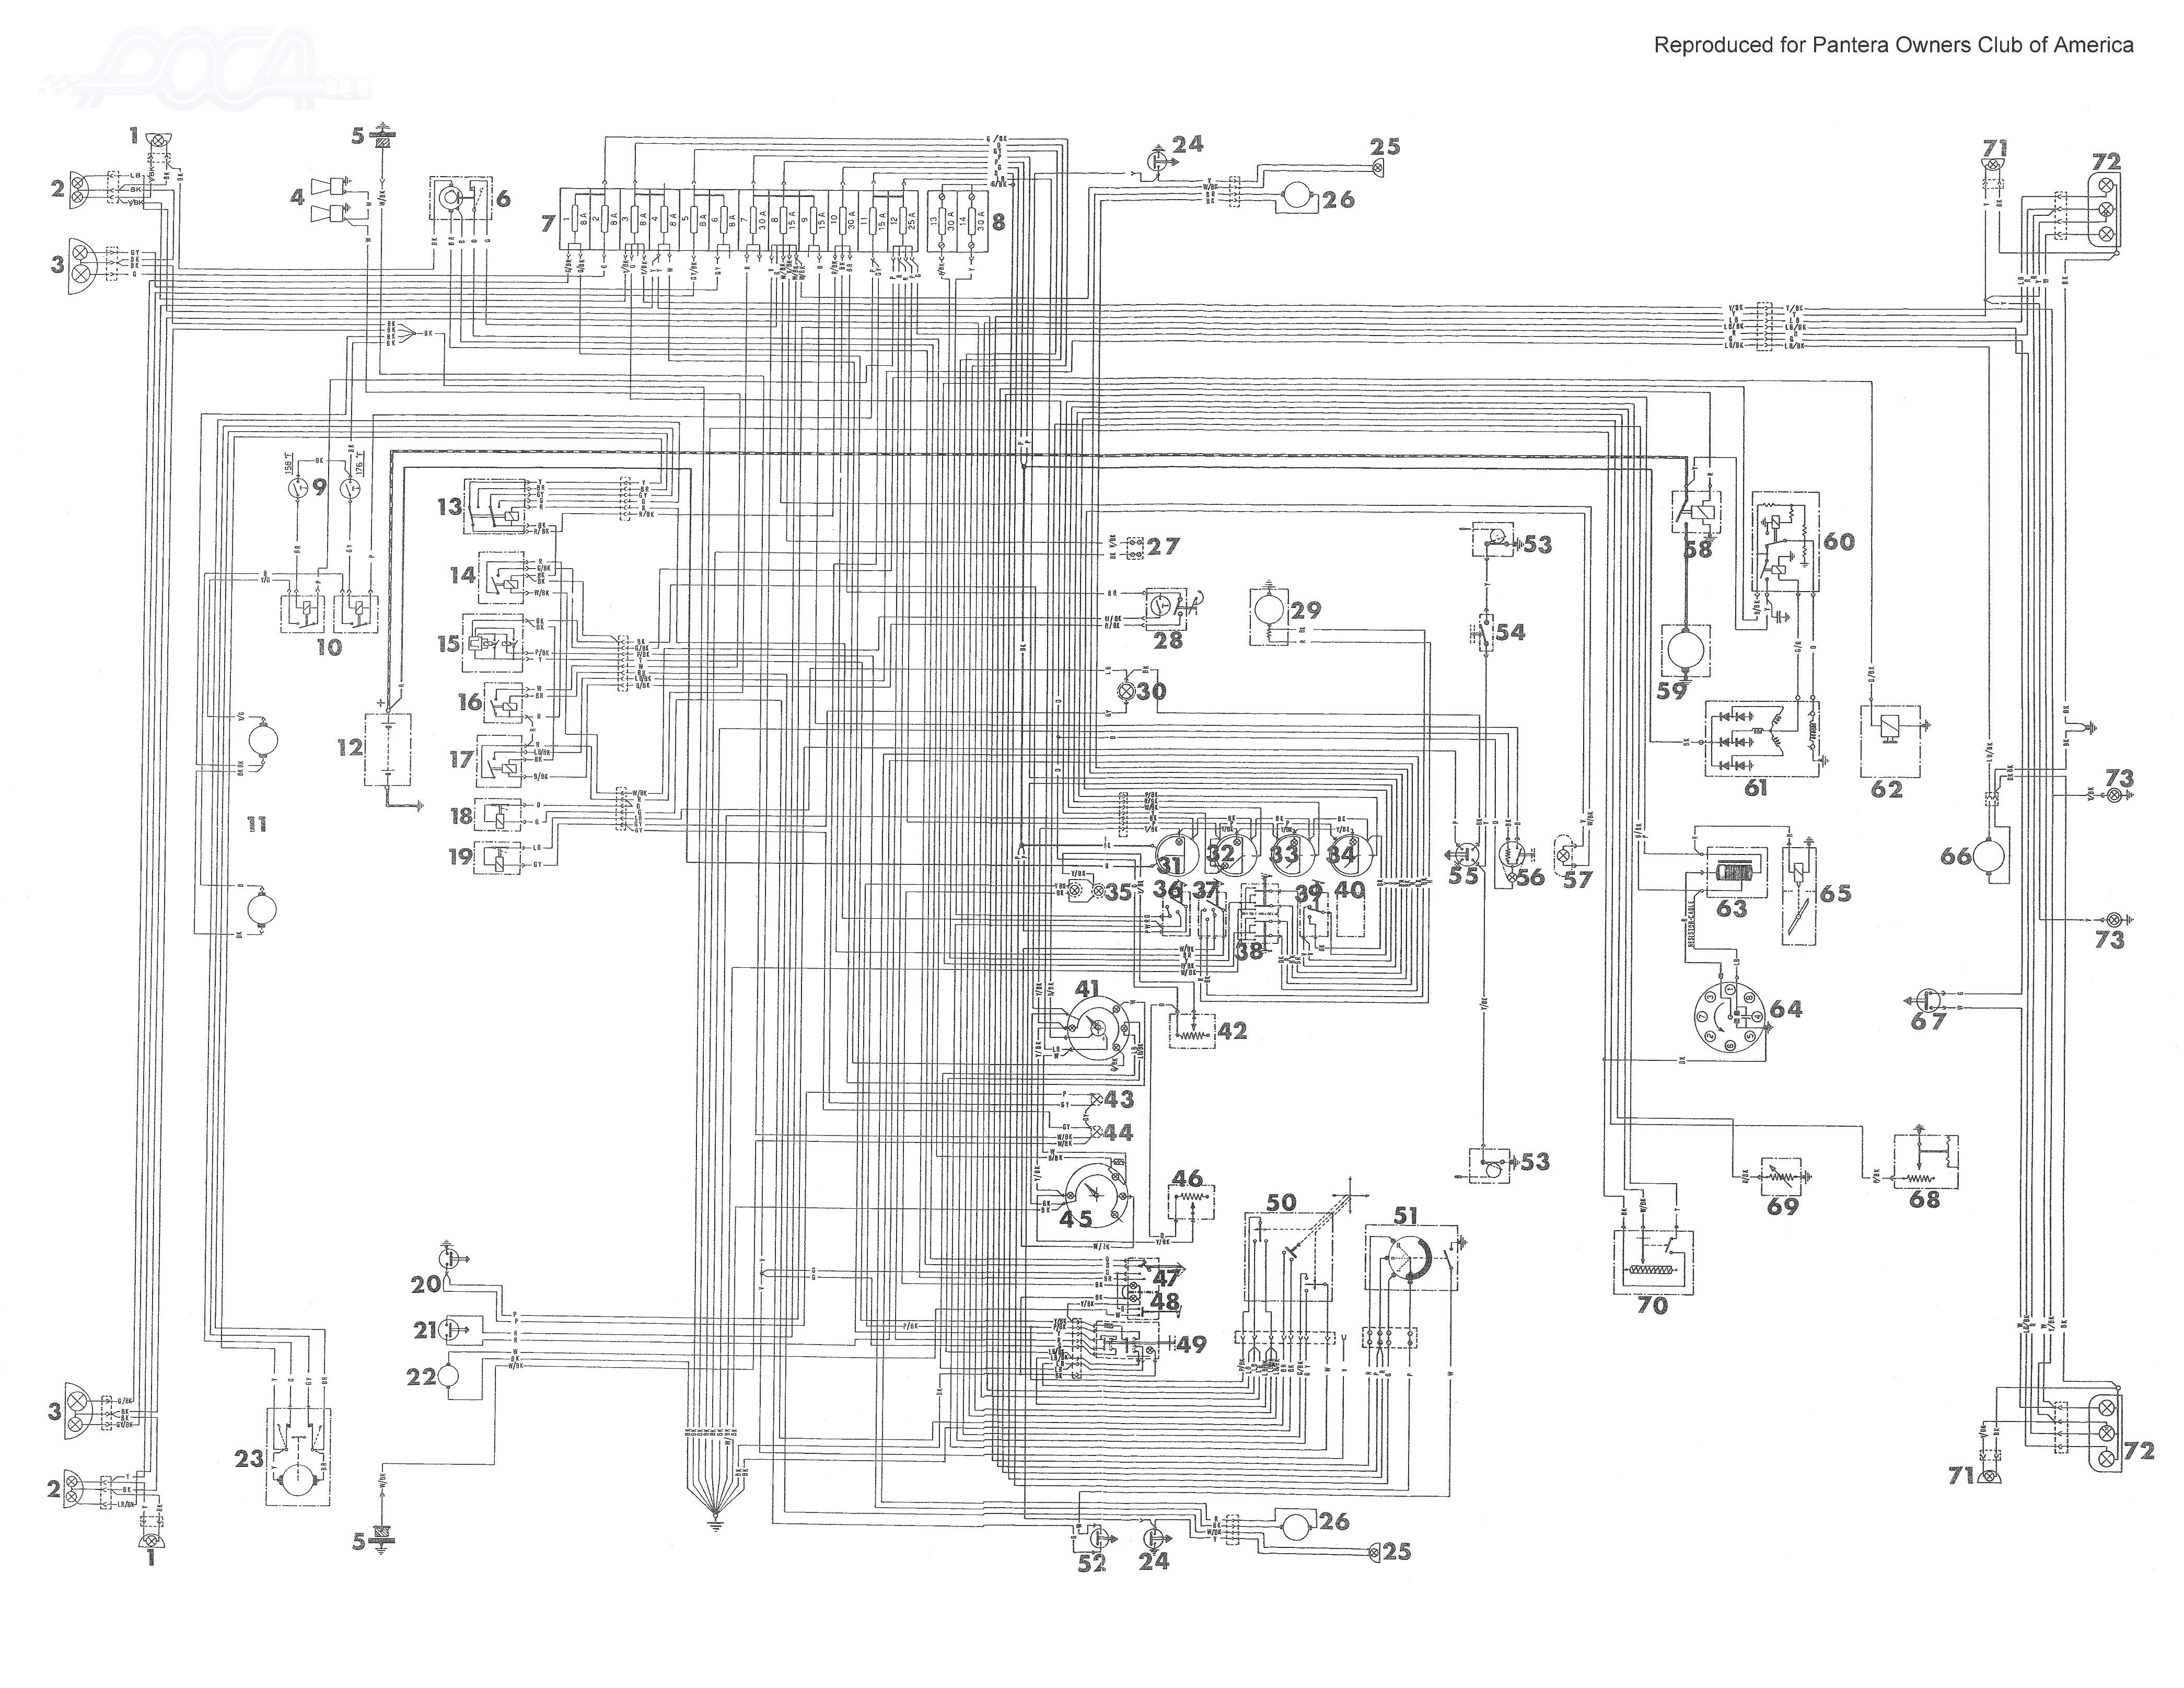 2005 Kenworth Cooling Fan Wiring Diagram - Wiring Diagram Mega on peterbilt air horn diagram, kenworth t300 wiring diagram, kenworth w900b wiring diagram, 379 peterbilt fuse diagram, 2000 kenworth w900 fuse diagram, volvo vnl64t wiring diagram, kenworth t680 wiring diagram, kenworth t600 wiring diagram, kenworth fuse panel diagrams, 1999 kenworth wiring diagram, kenworth heavy truck wiring diagram, kenworth w900 parts diagram, kenworth t660 wiring diagram, kenworth air line diagram, 1995 kenworth wiring diagram, mack truck fuse diagram, kenworth t400 wiring diagram, ddec iv ecm wiring diagram, kenworth w900 wiring diagram, kenworth t2000 wiring diagrams,